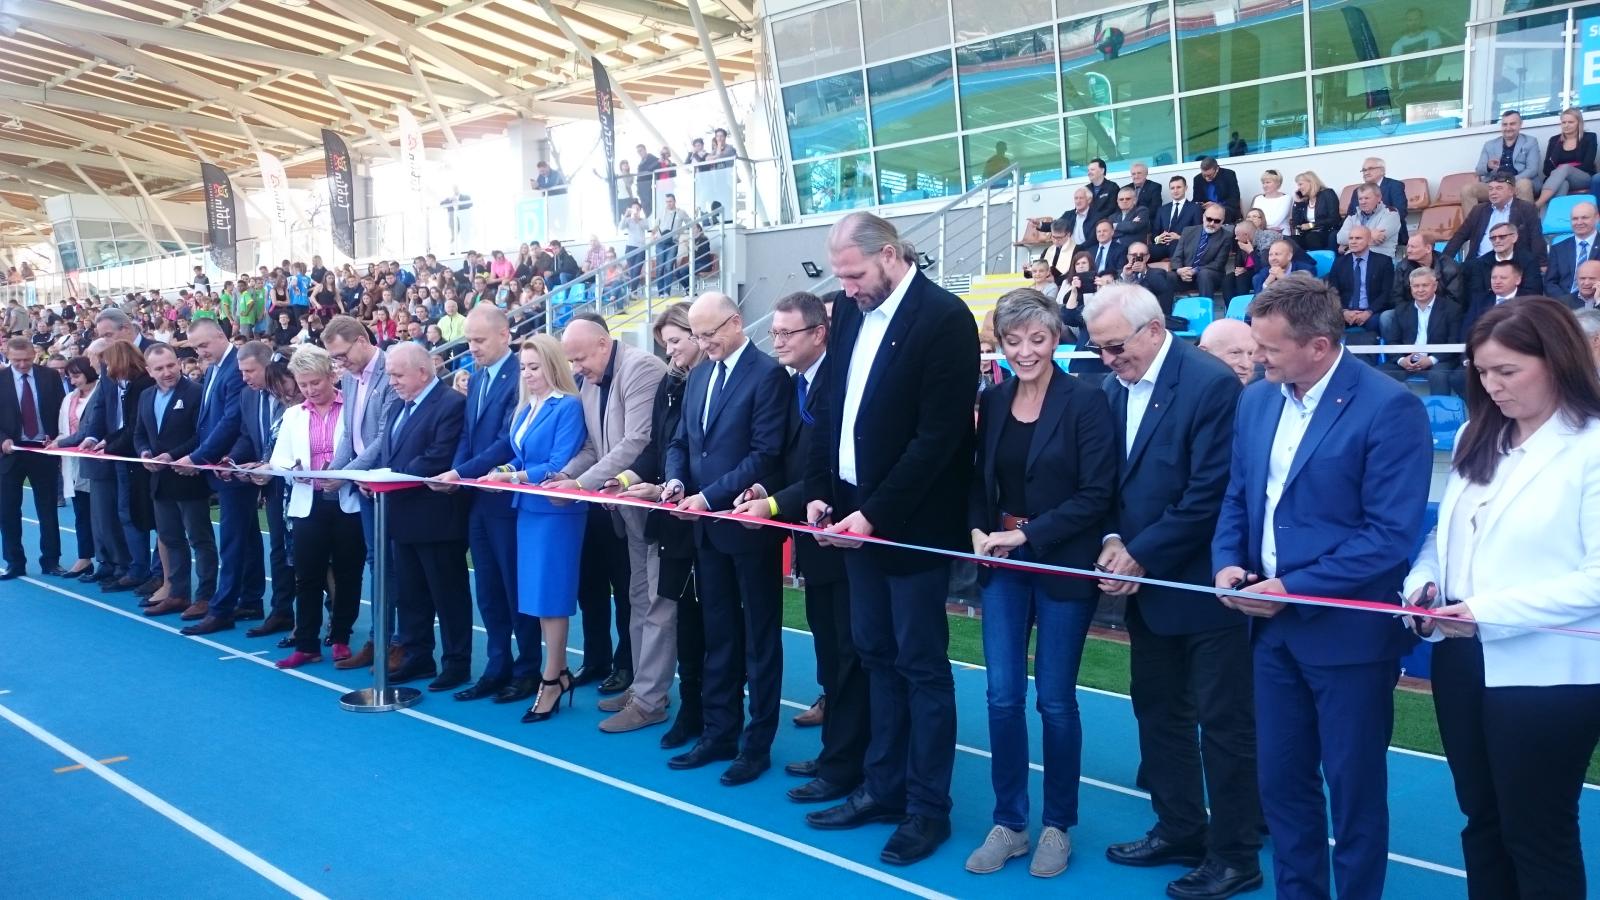 Stadion lekkoatletyczny już otwarty